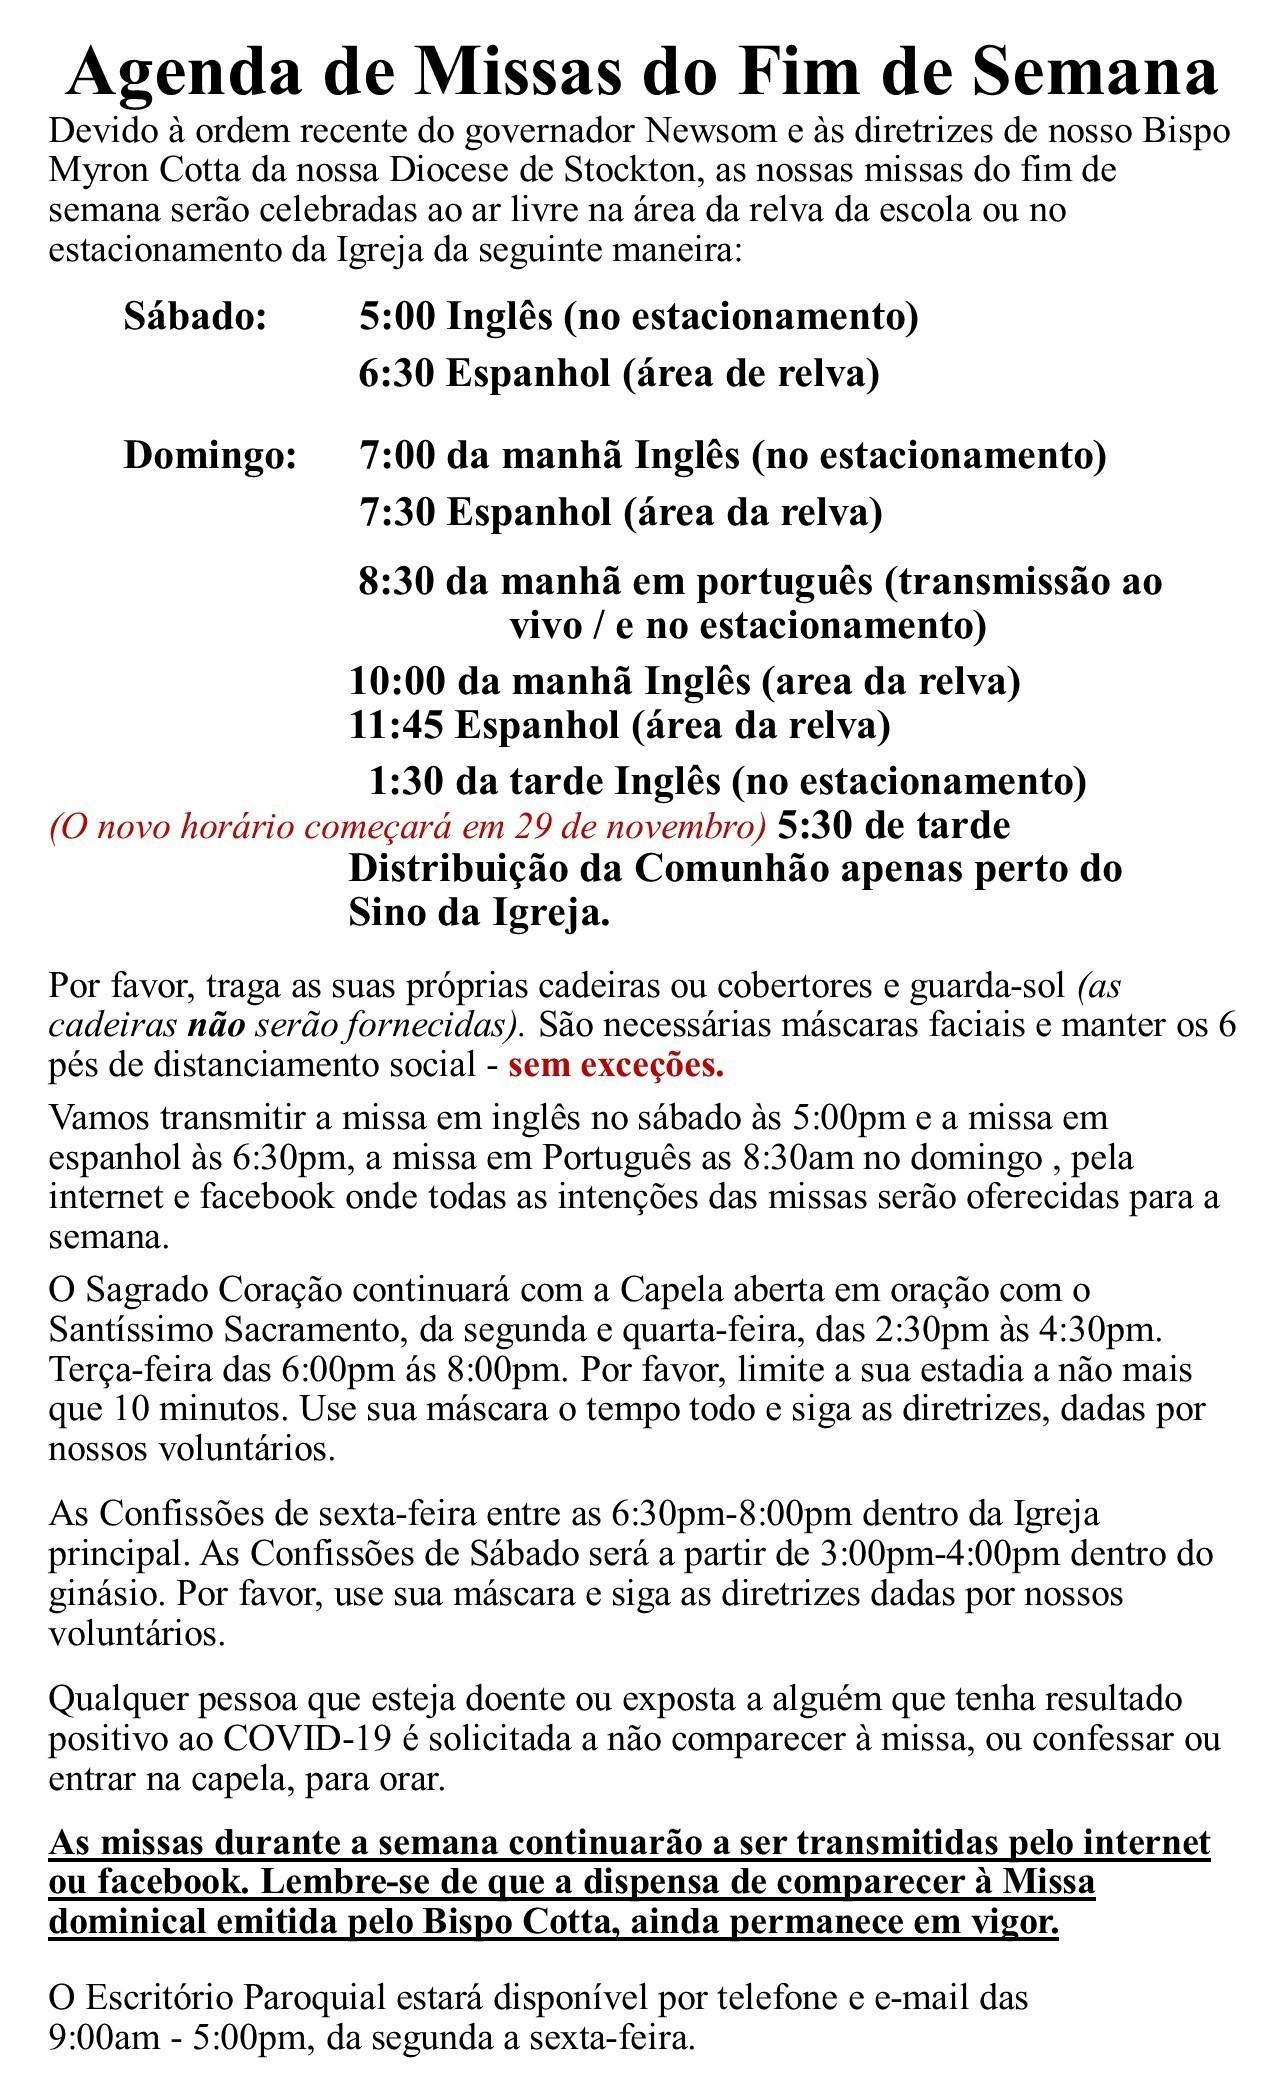 New Directives Portuguese 11 2020